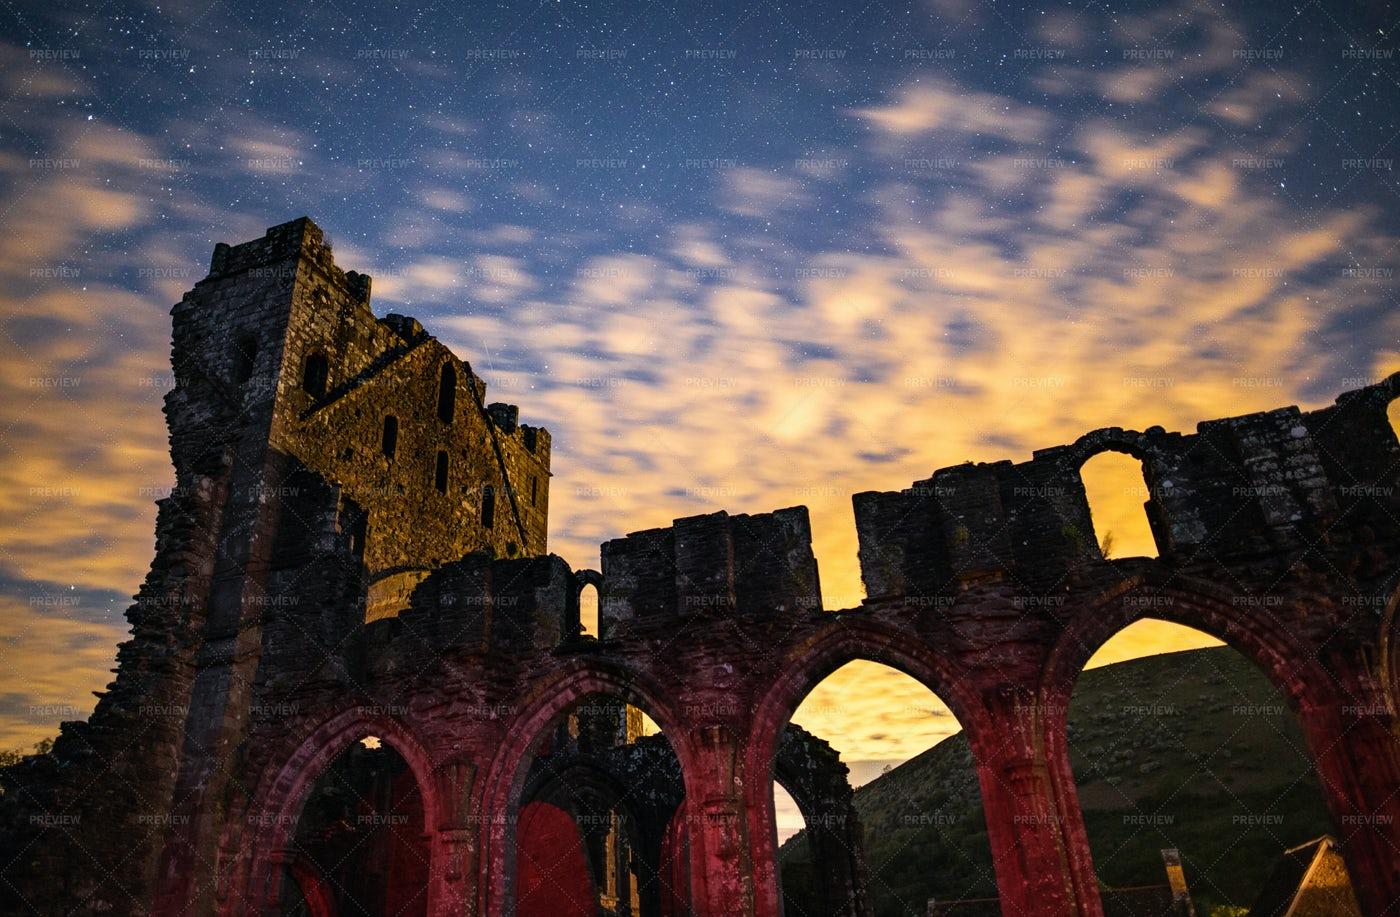 Priory Ruins At Night: Stock Photos